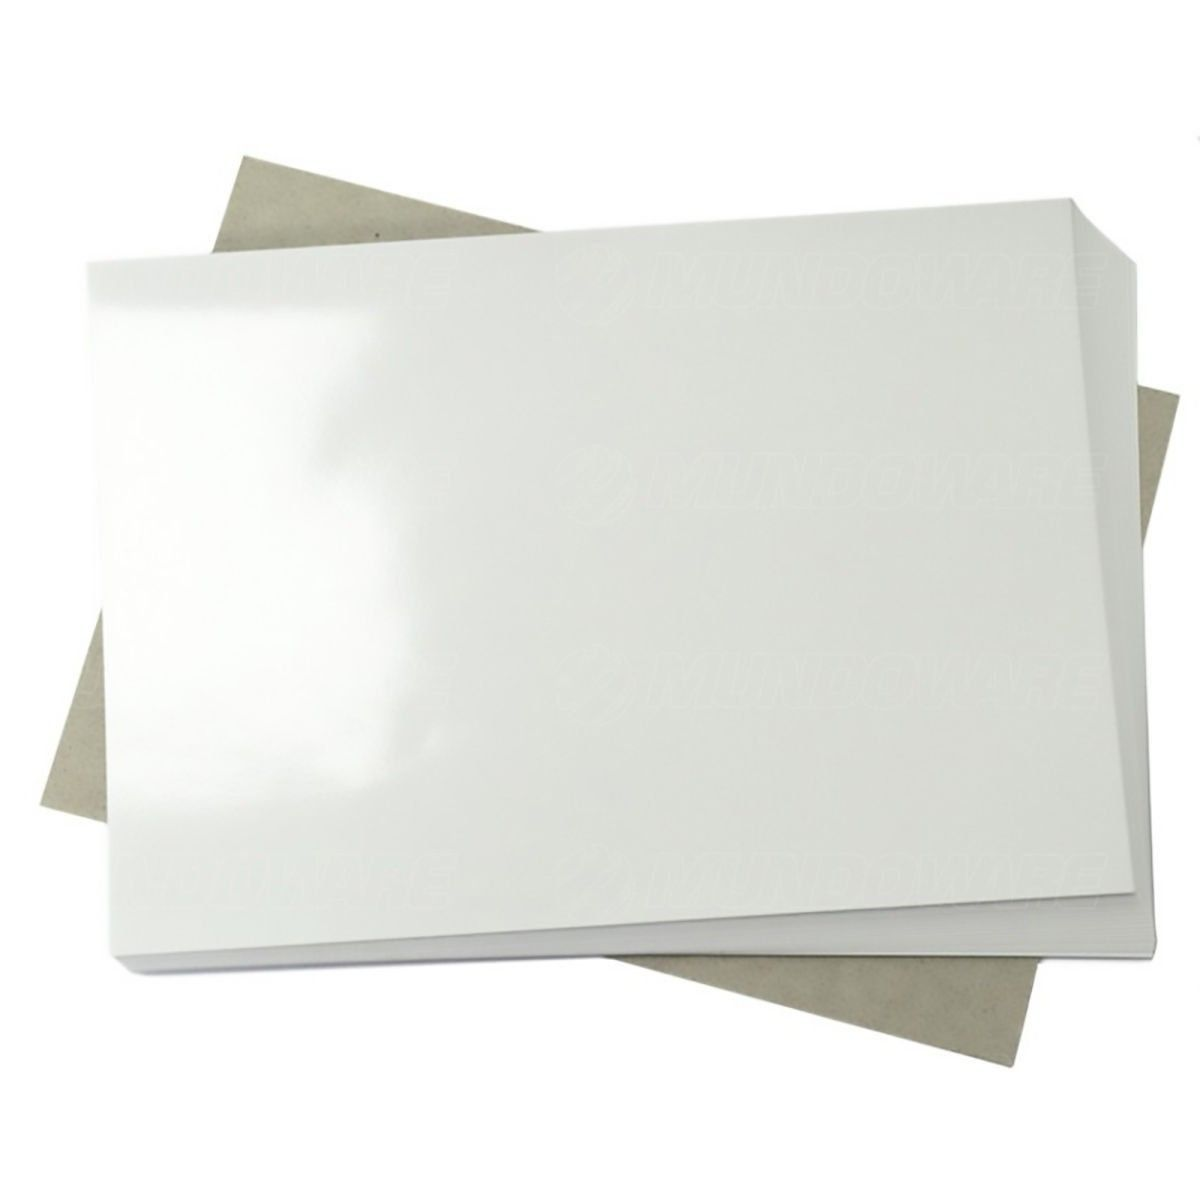 Papel Adesivo Fotográfico 115g A4 Branco Brilhante Resistente à Água / 500 folhas